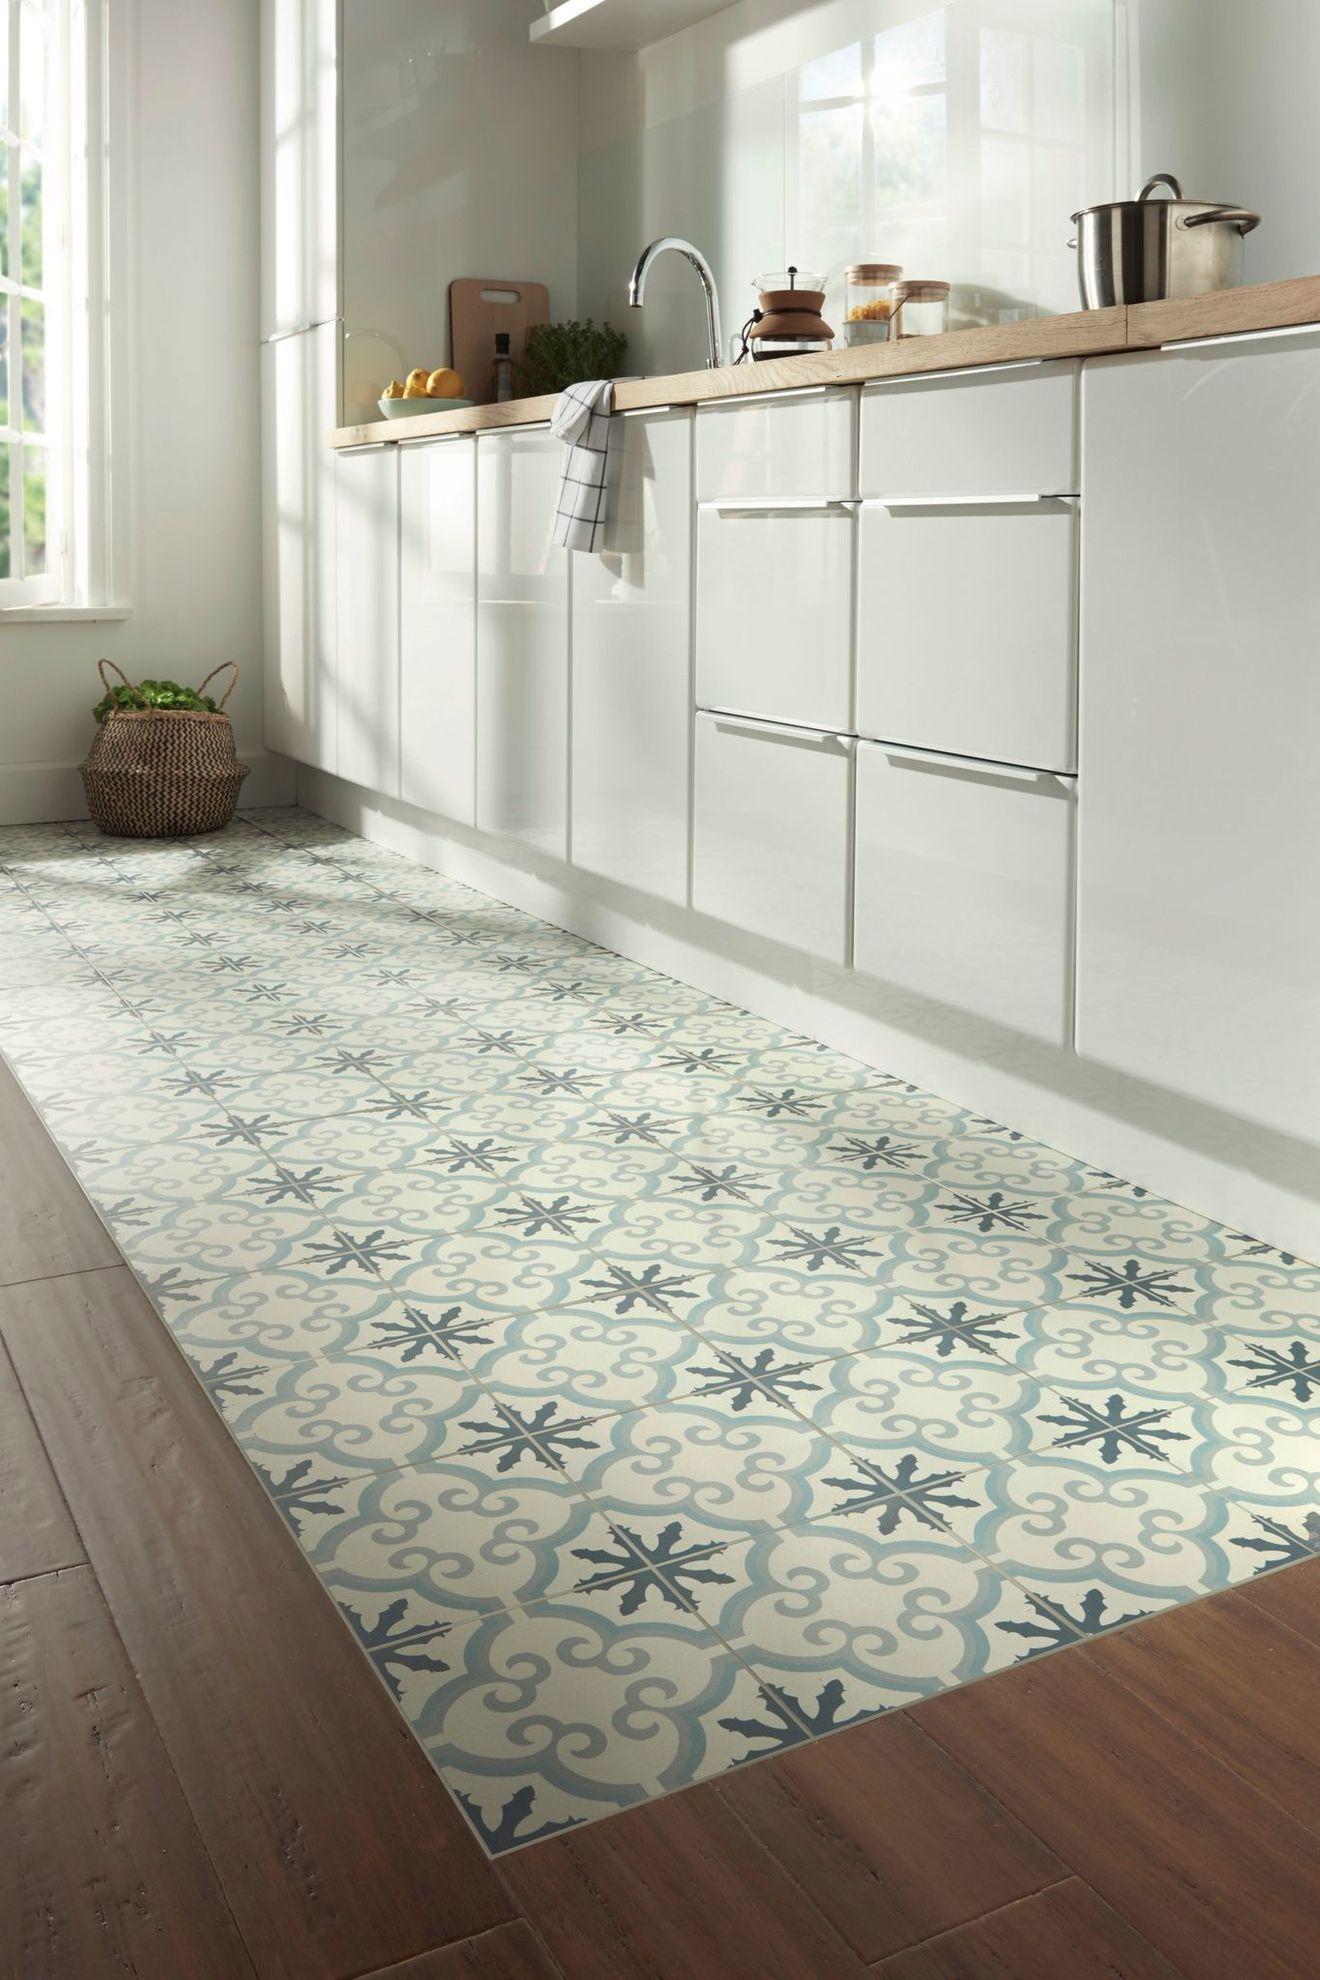 12+ Ideas Tile Kitchen Backsplash 12   subway tile ideas kitchen ...